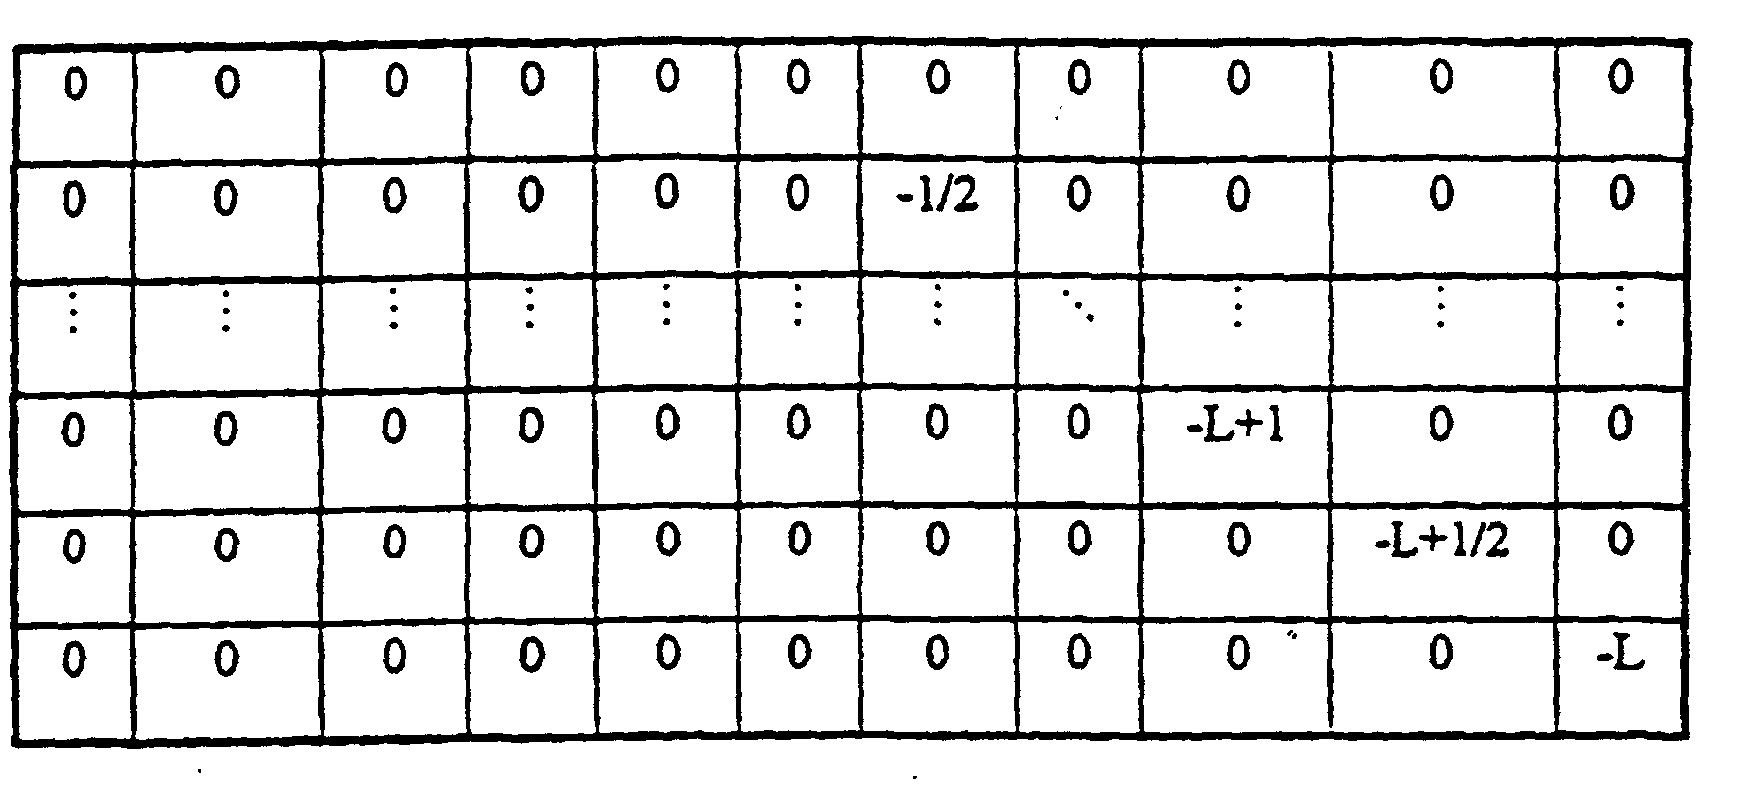 Ep1213854b1 Capacity Management In A Cdma System Google Patents Passive Tone Matrix Rather Like The Single Knob Control Figure 00510001